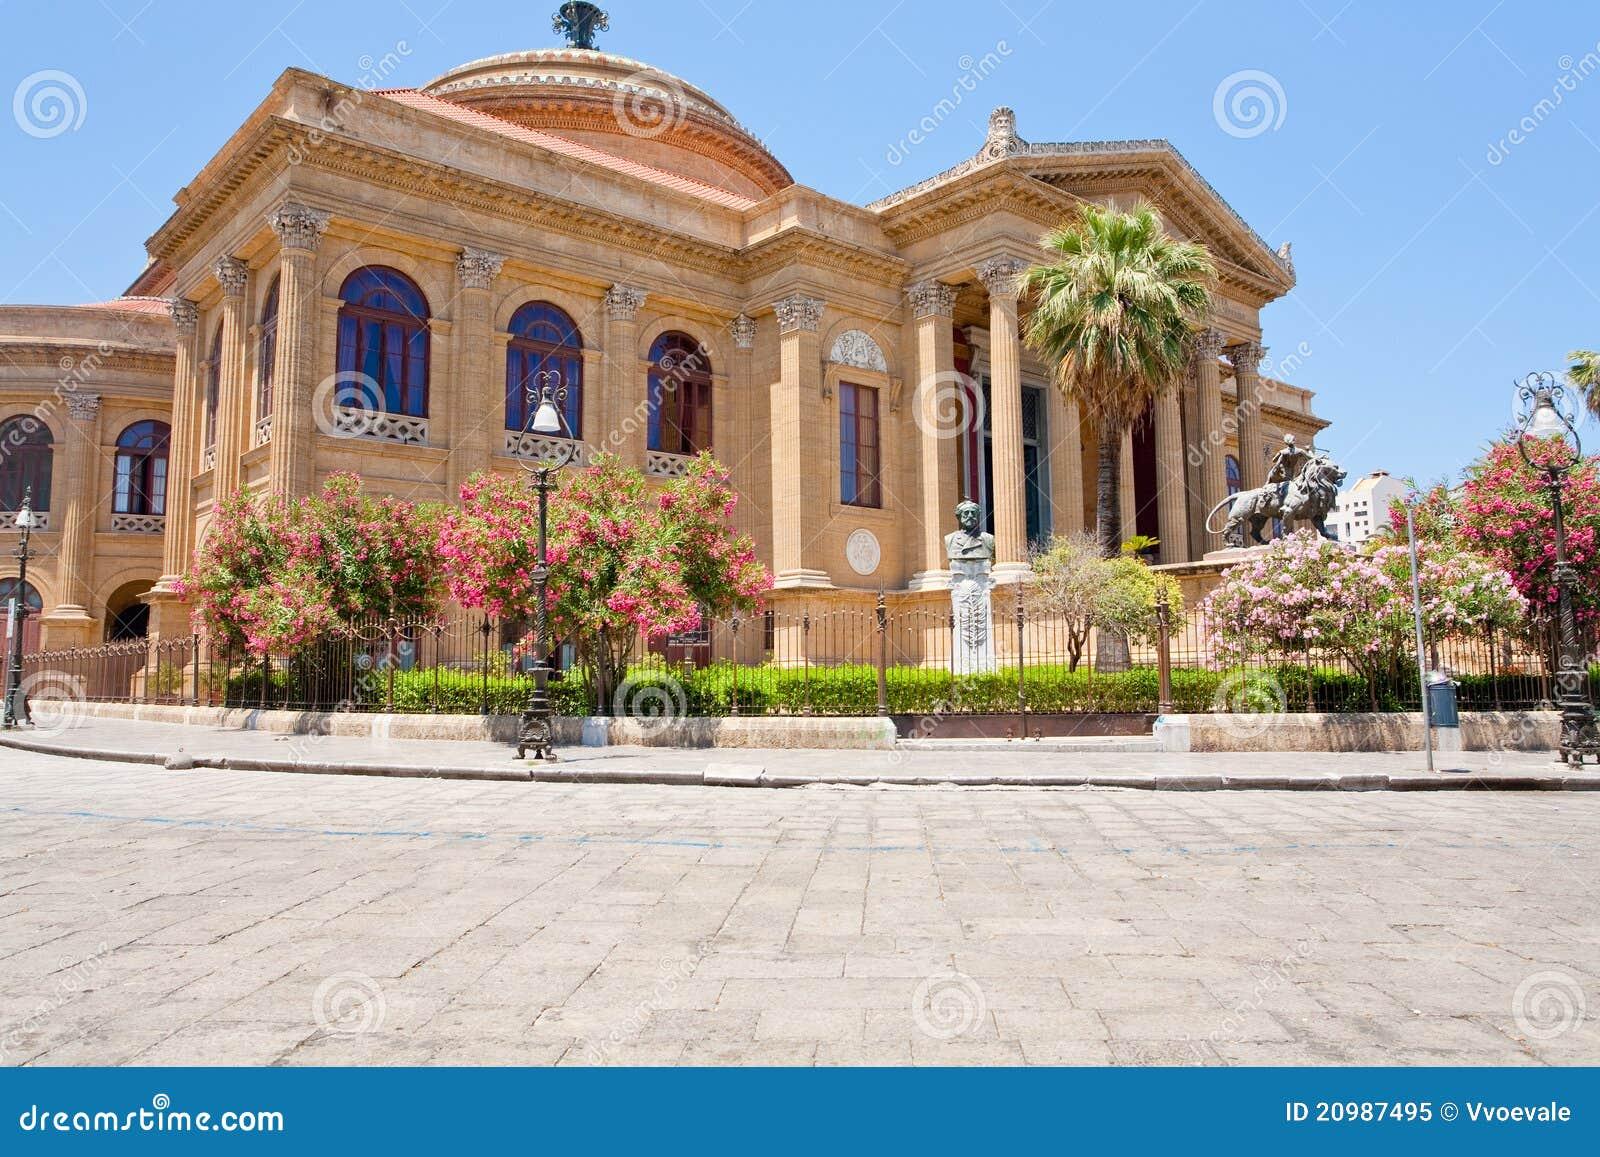 Teatro Massimo - Opera House In Palermo, Sicily Stock Image - Image ...